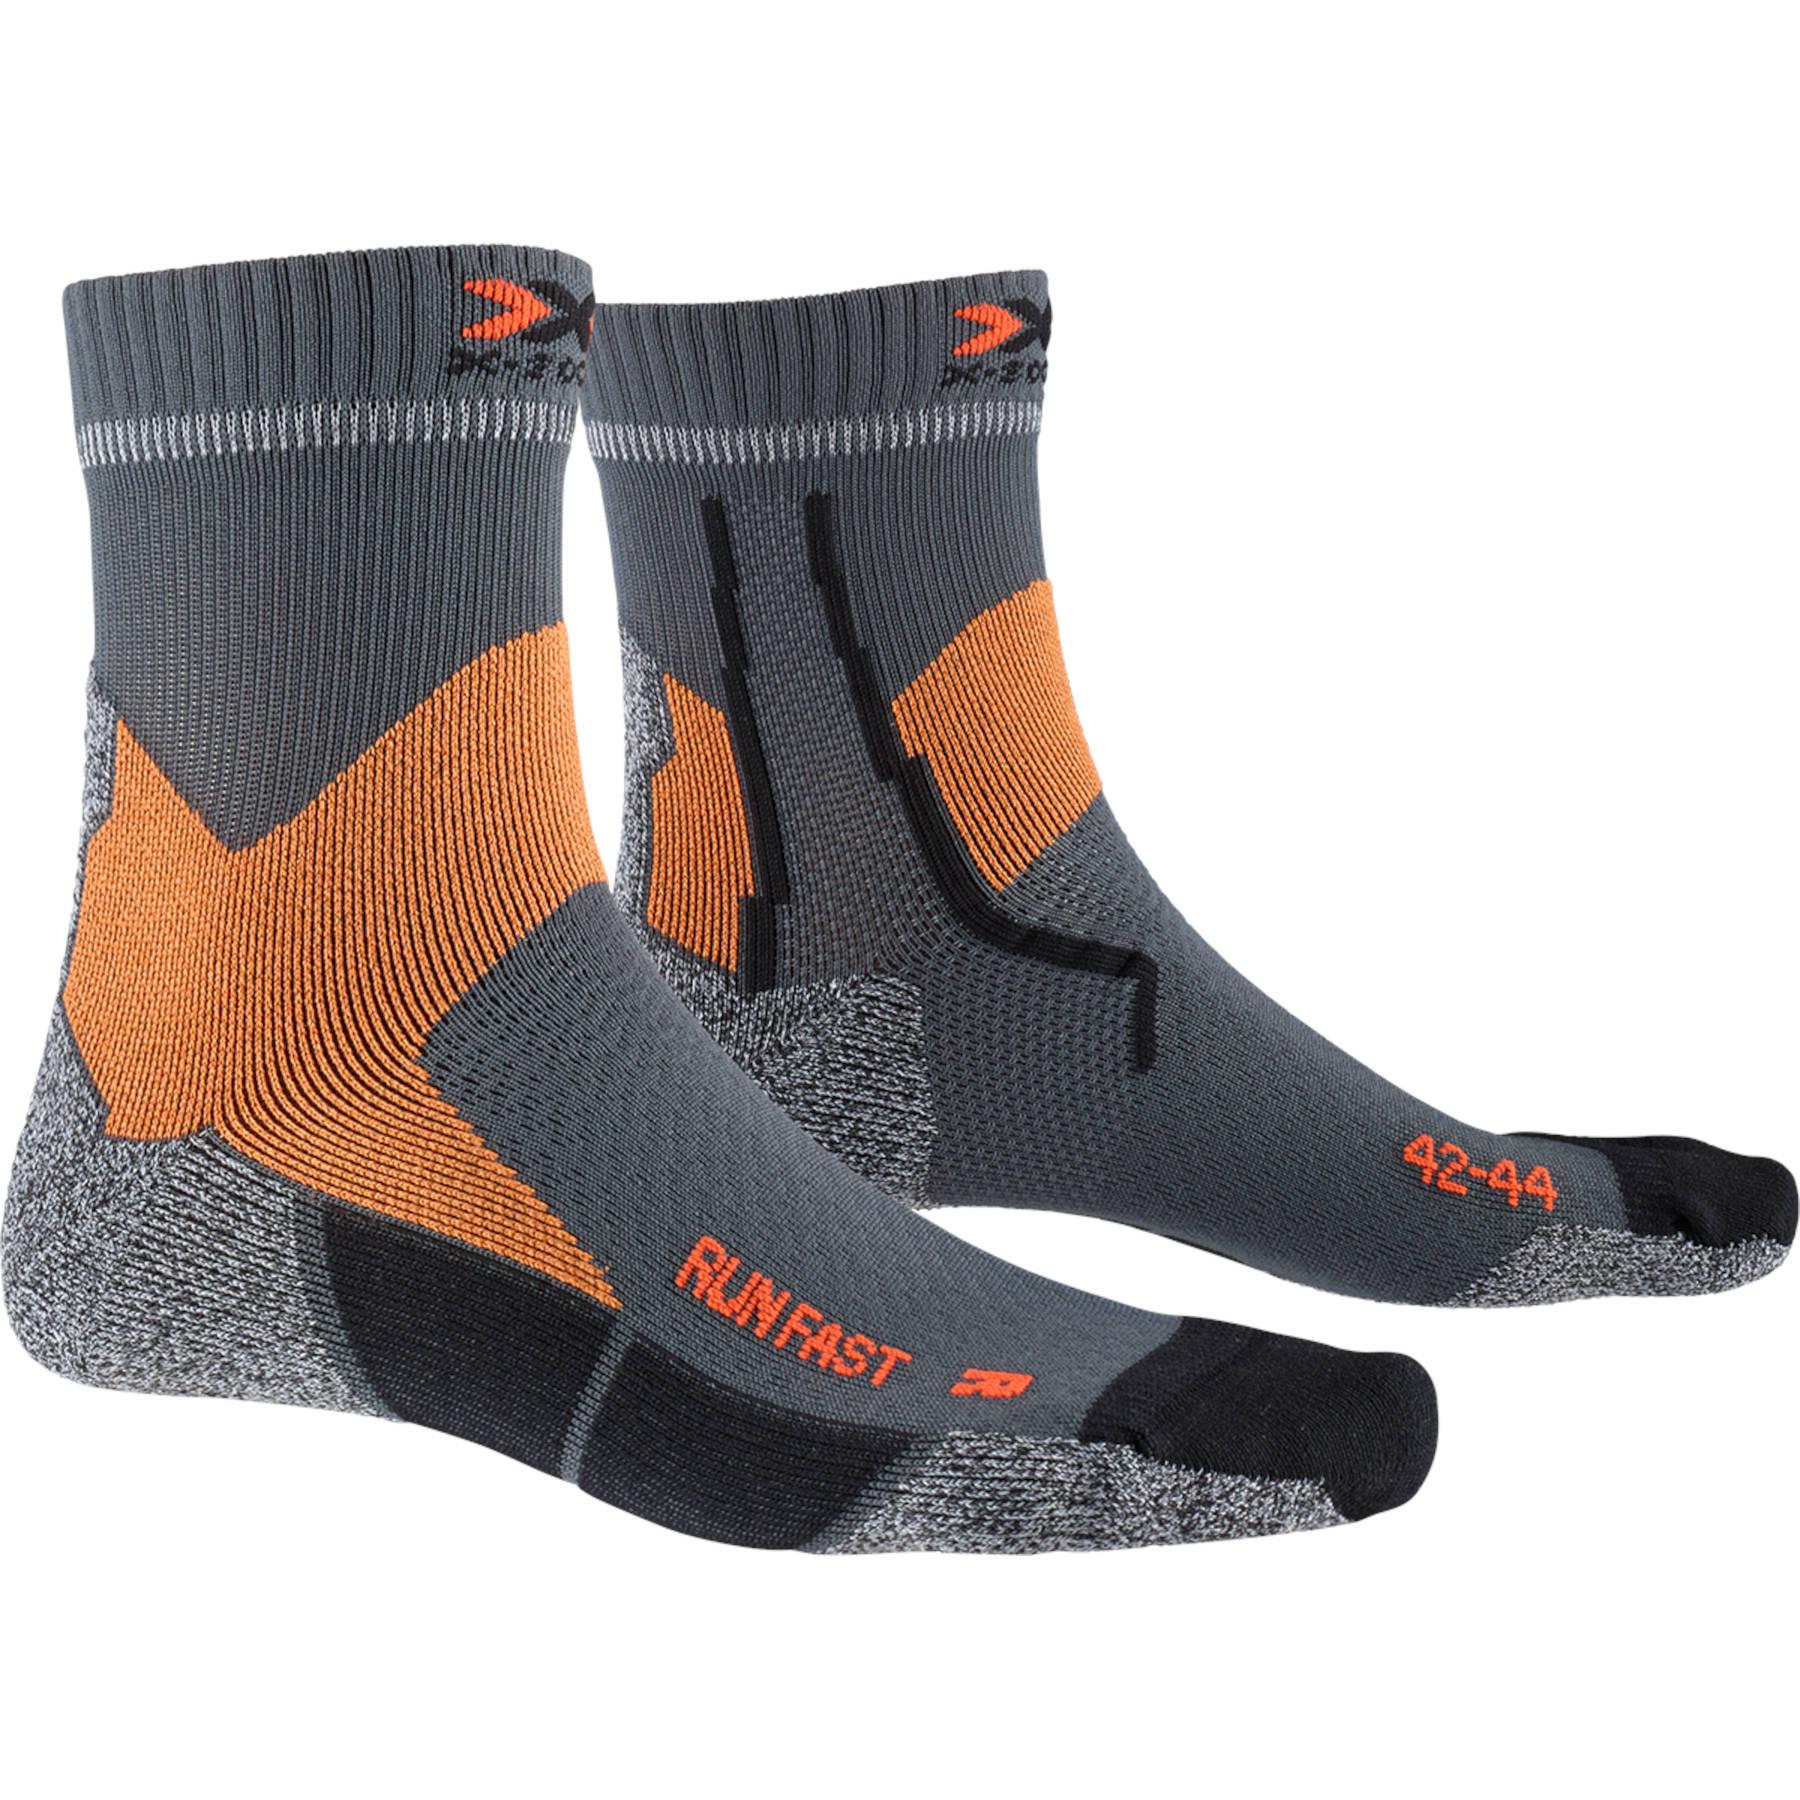 X-Socks Run Fast Laufsocken - pearl grey/sunset orange